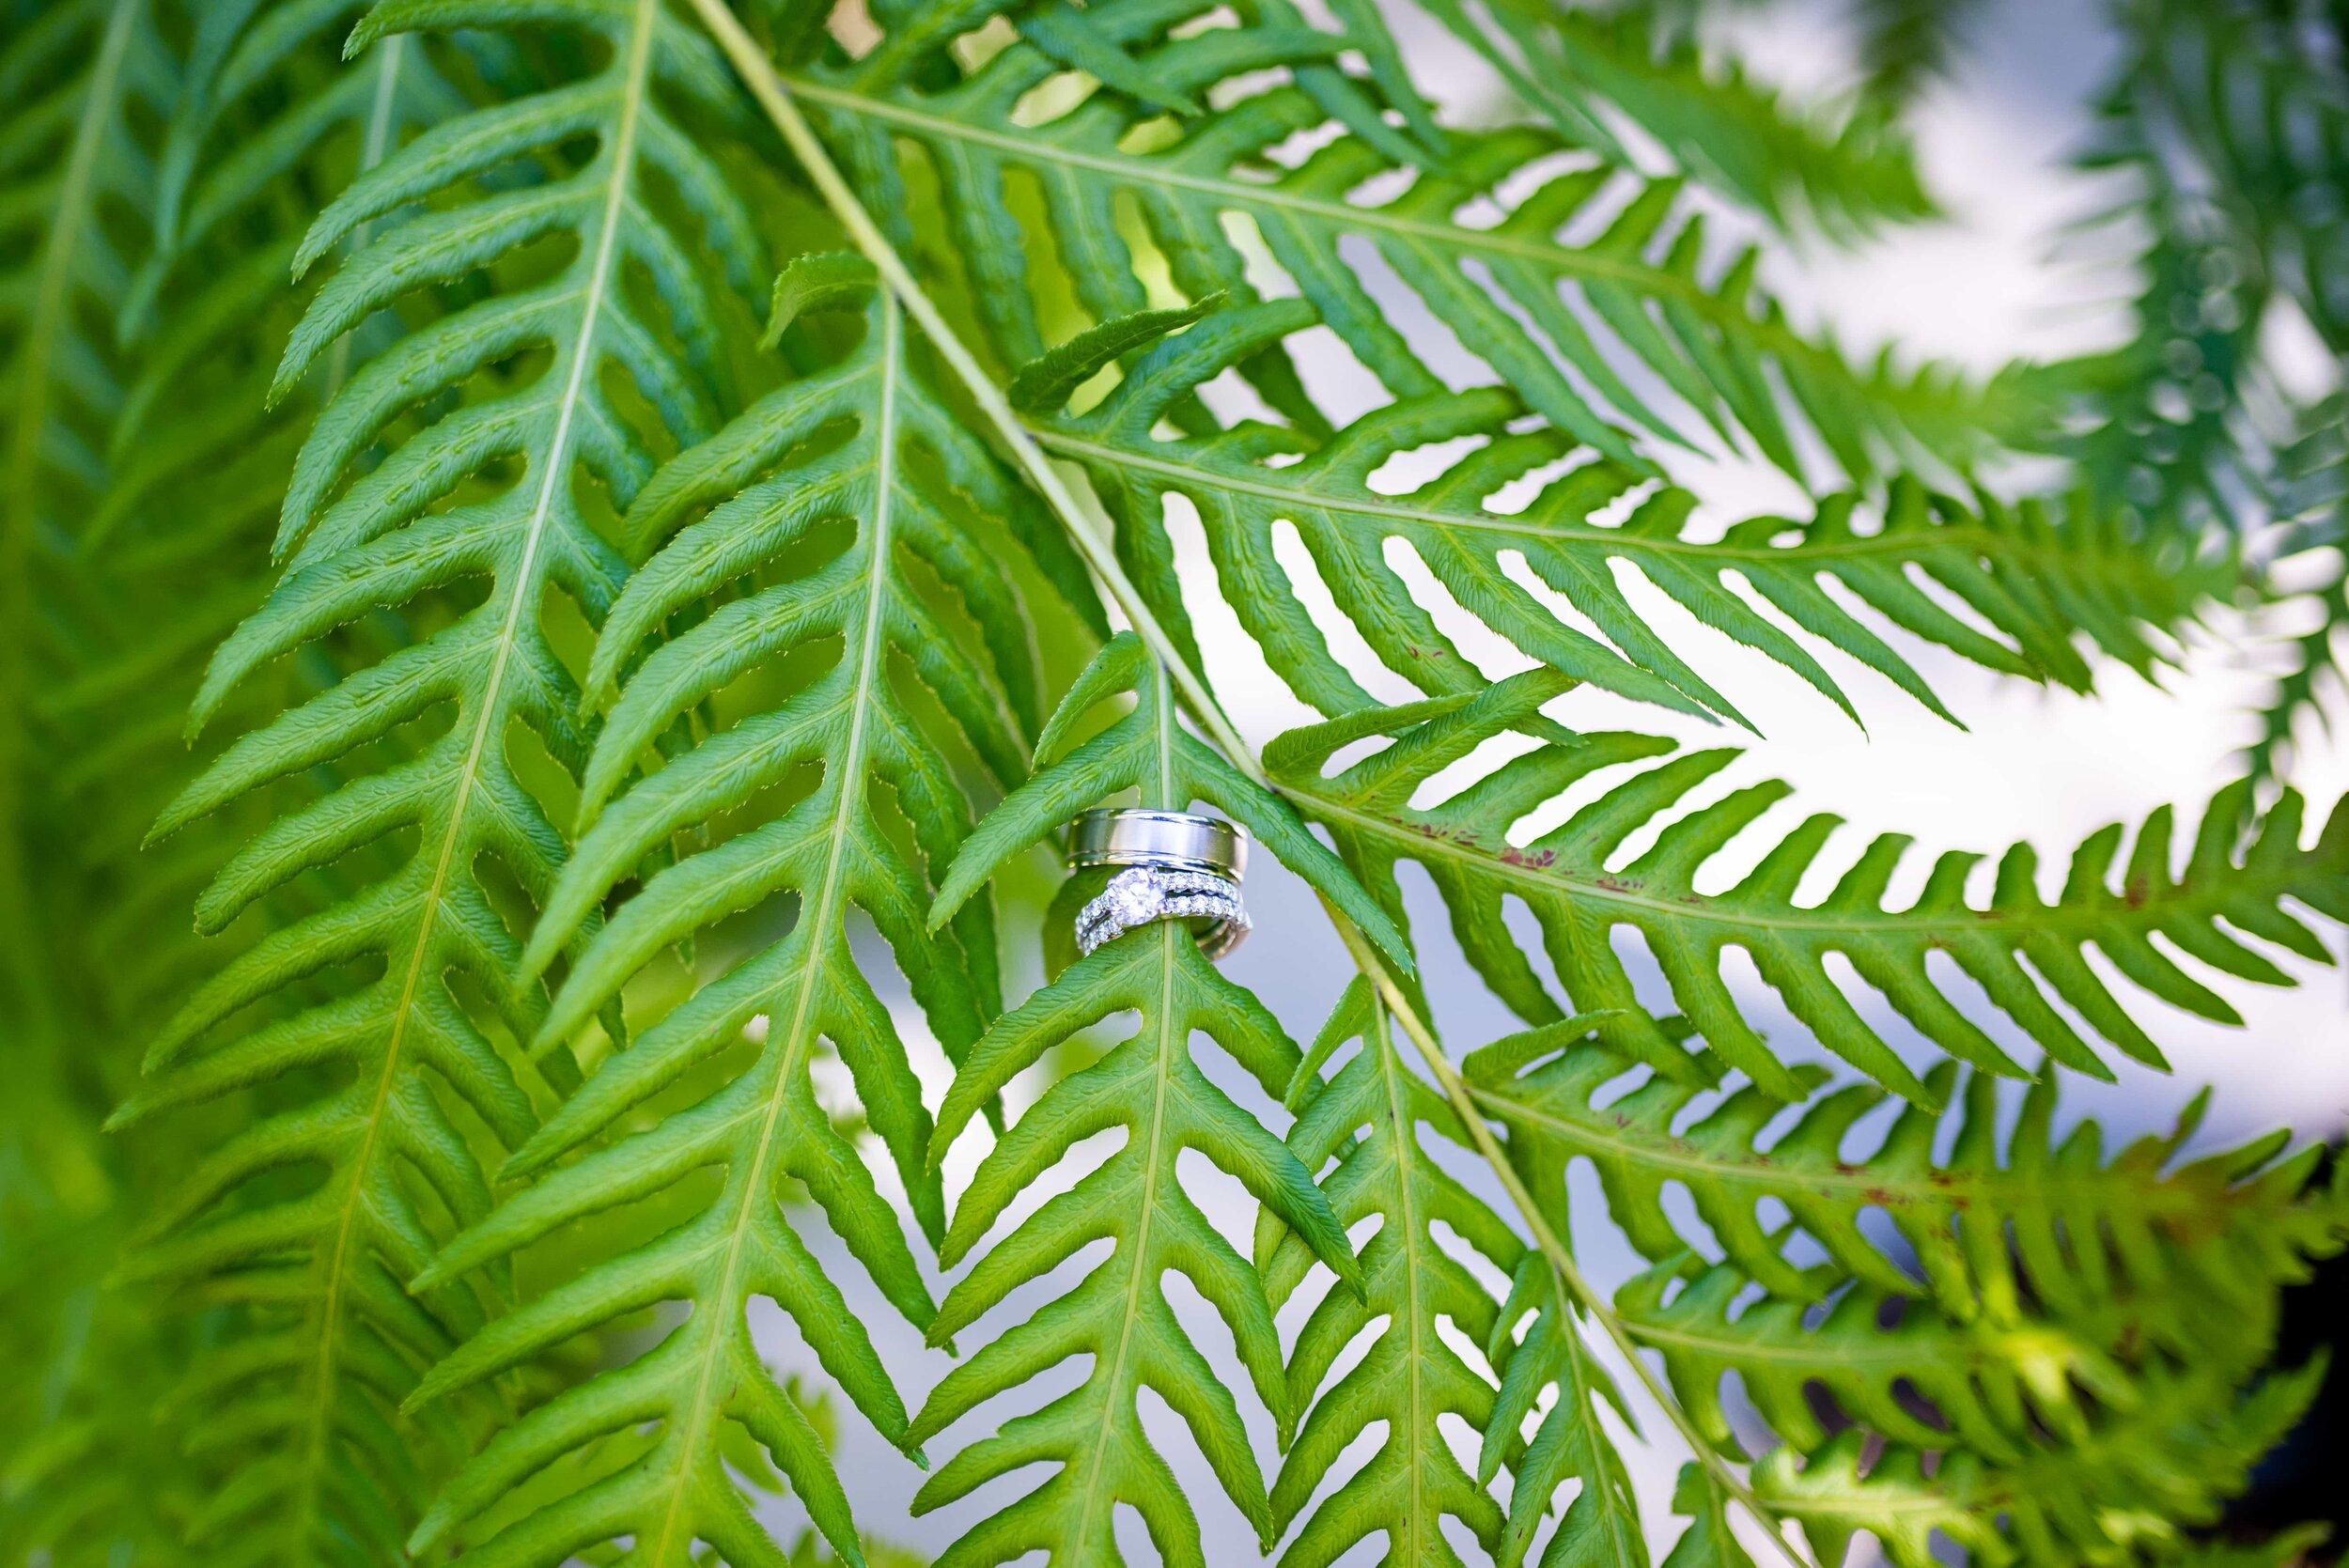 Detail of wedding rings on fern